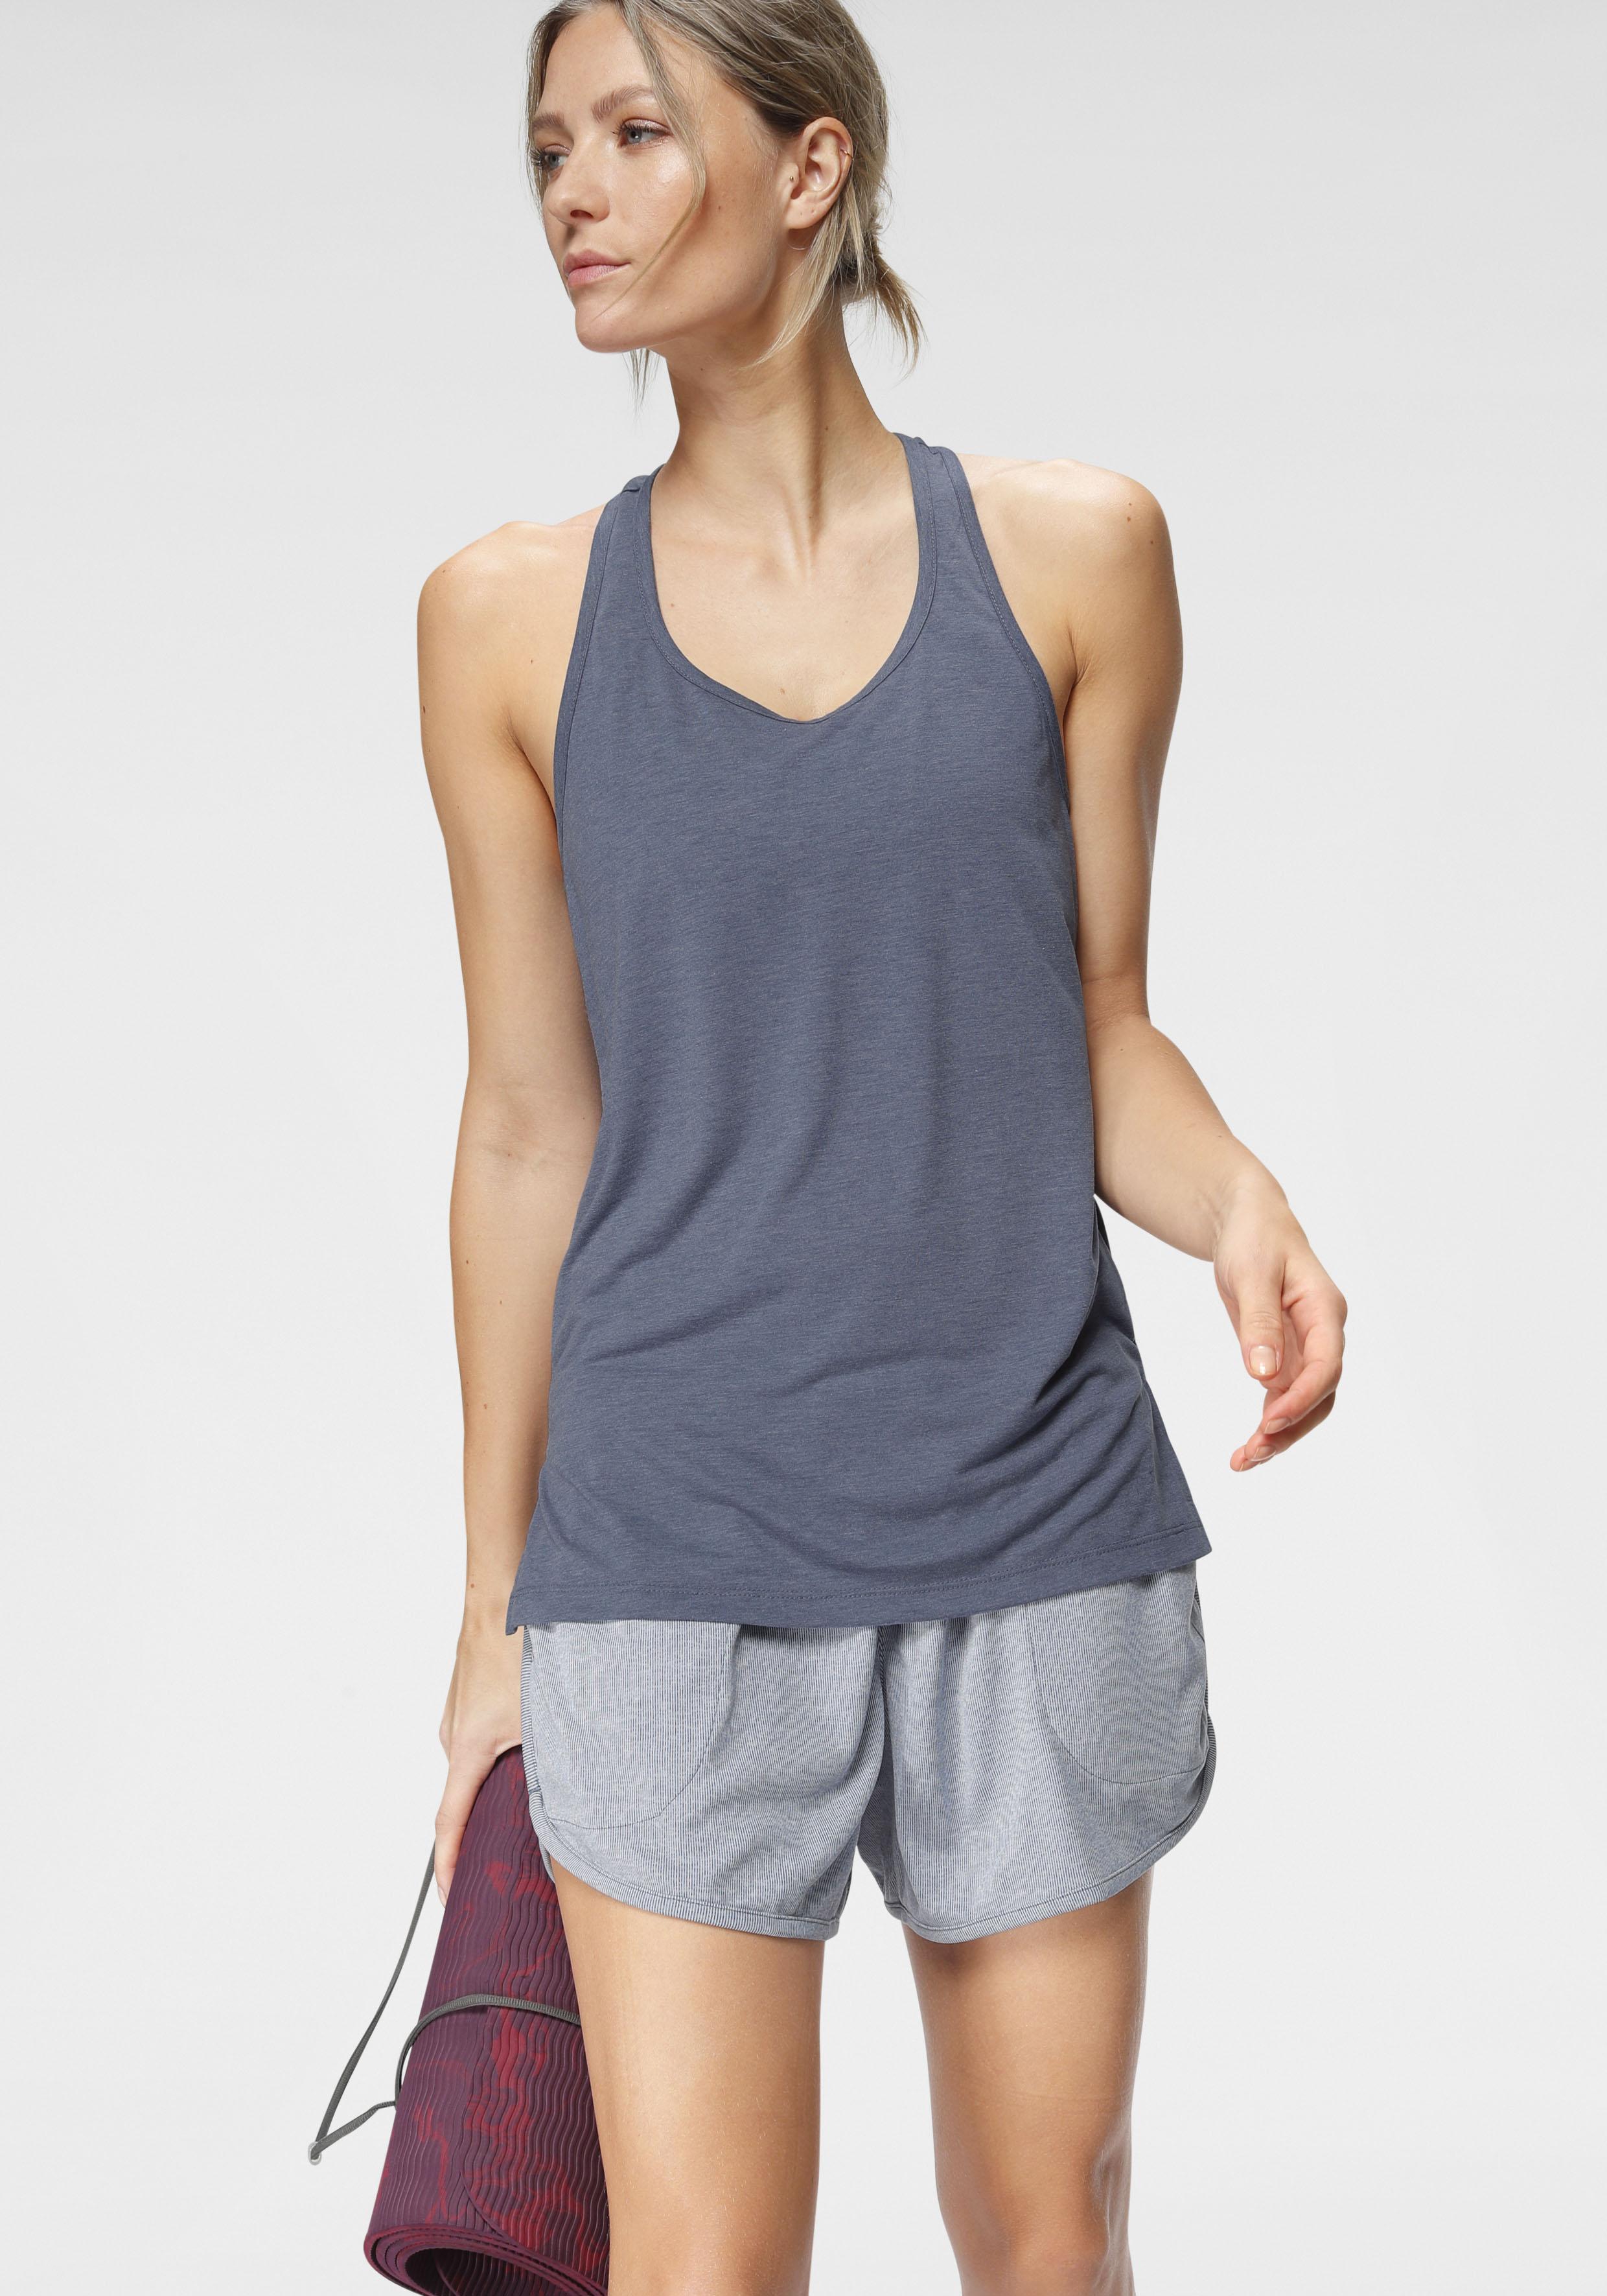 Nike Yogatop Nike Yoga Women's Tank, blau, Damen